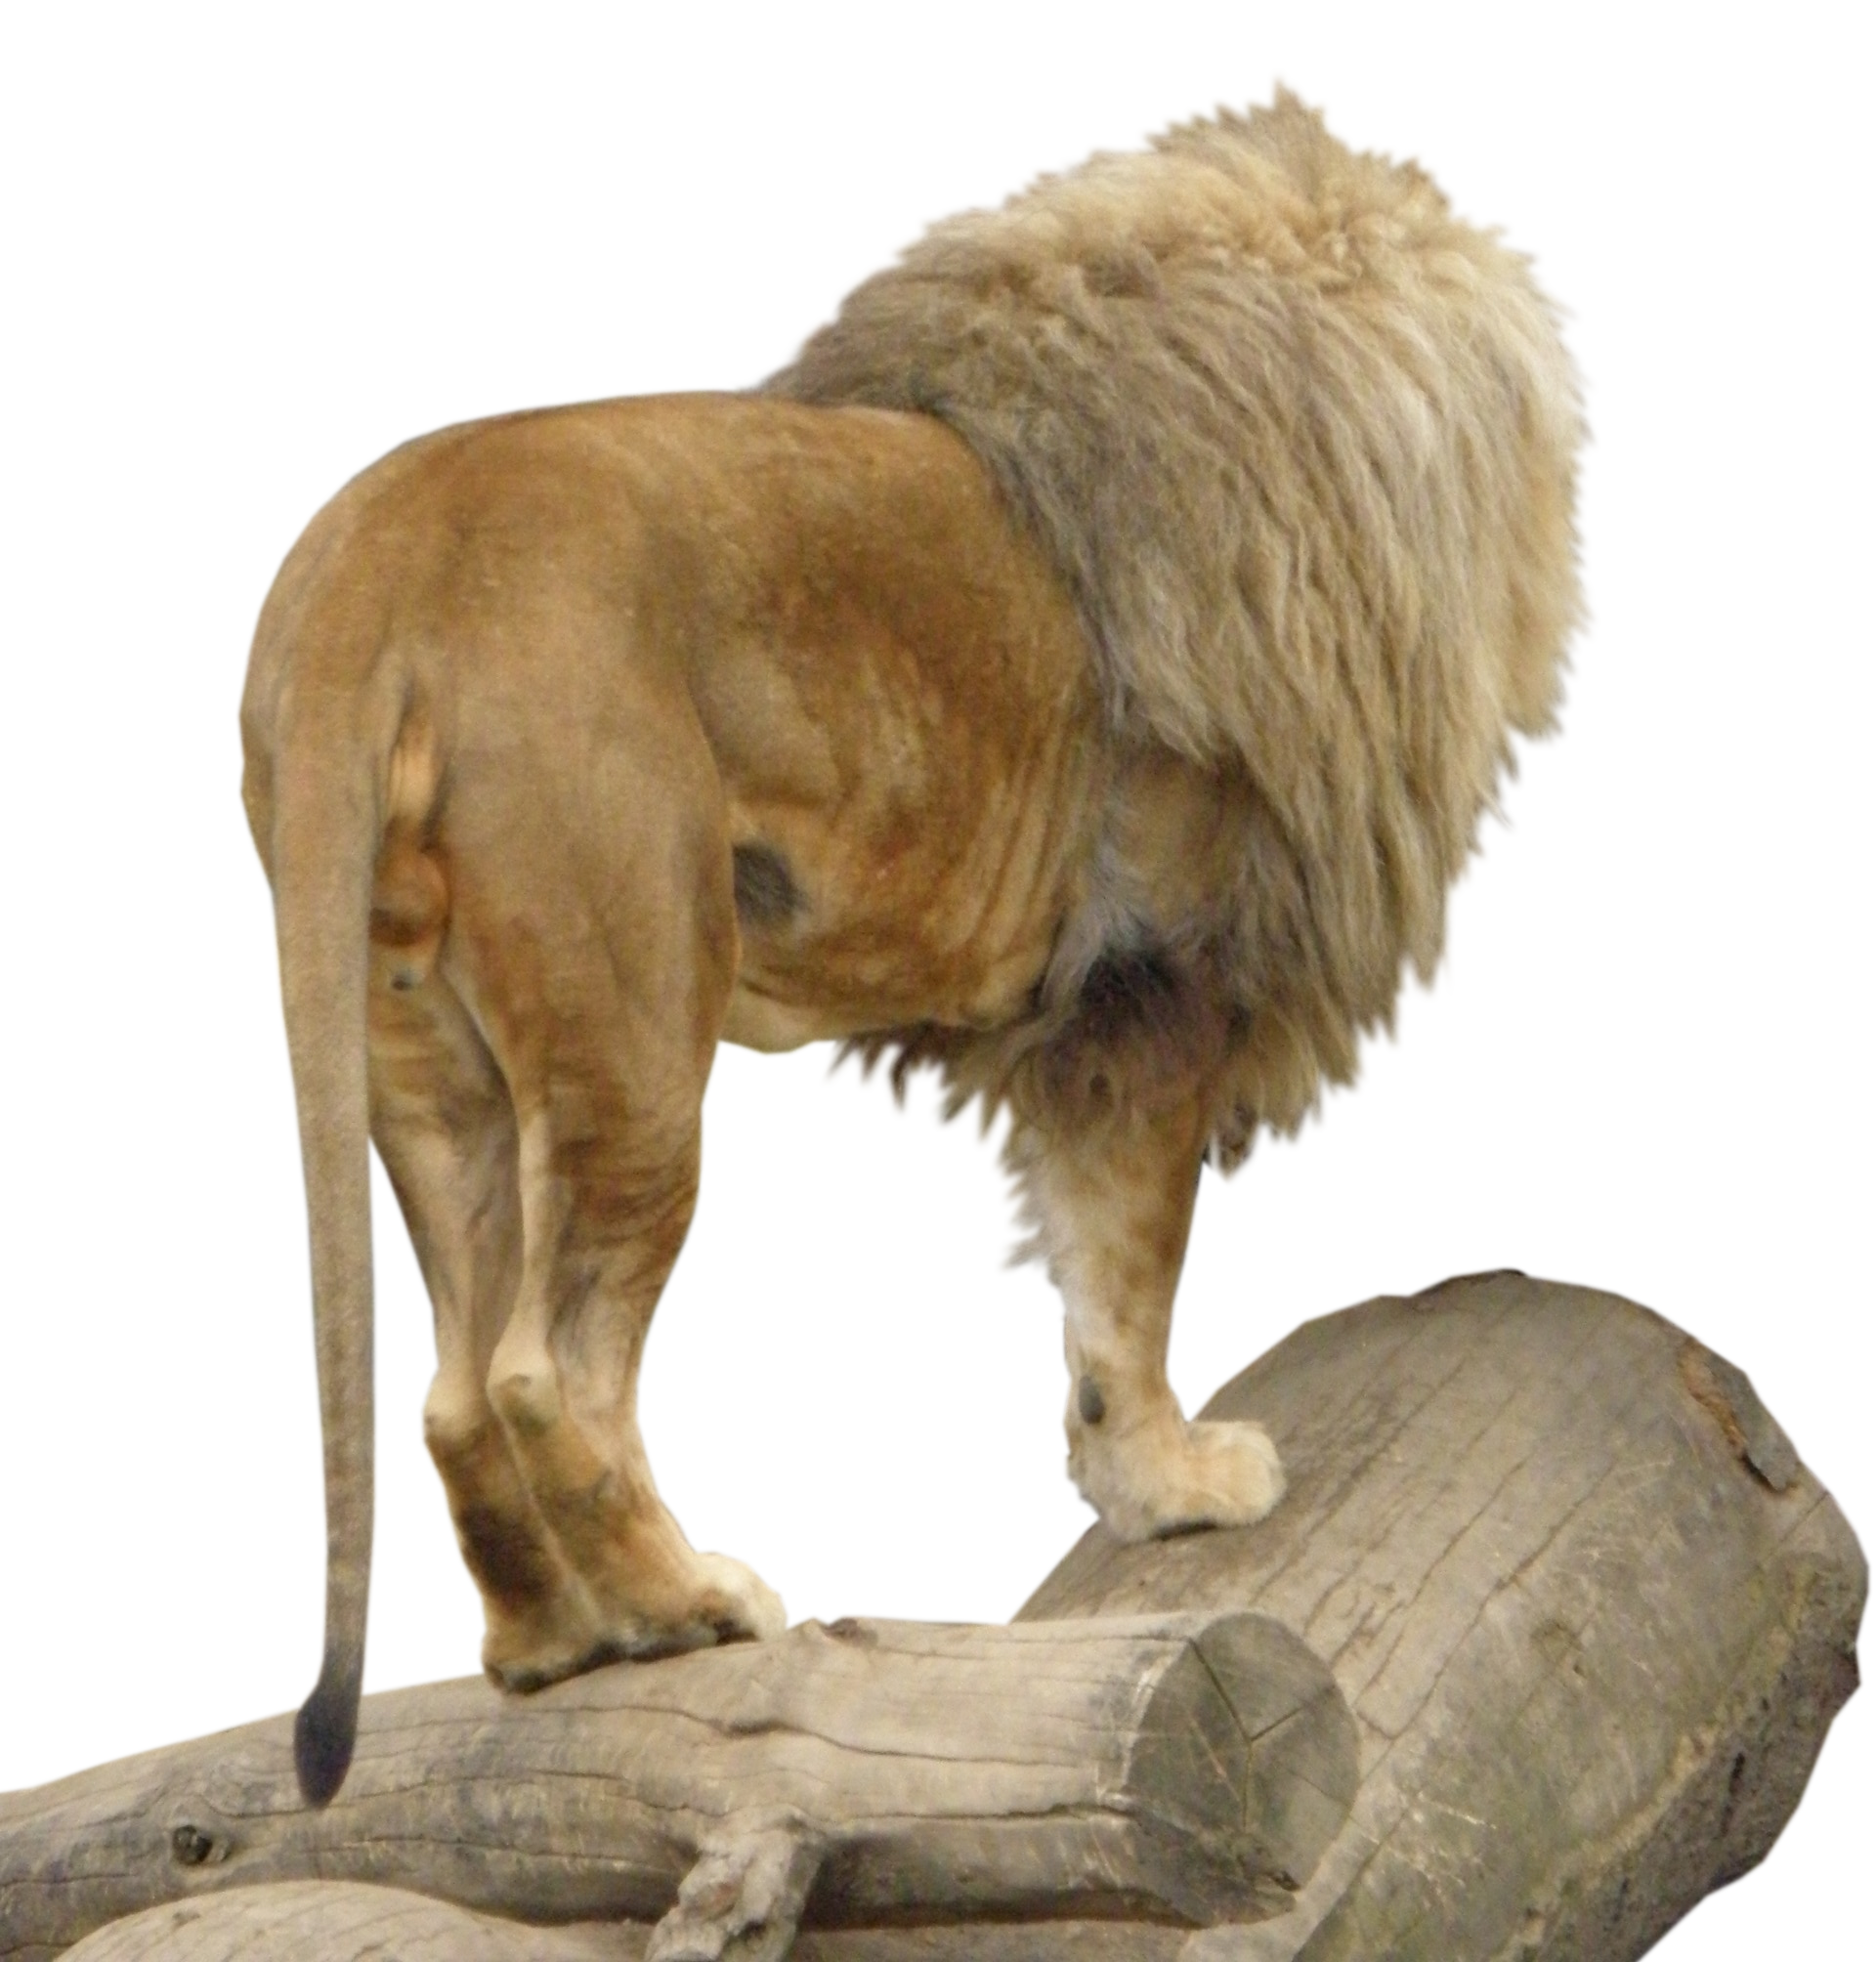 Lion Animal PNG Image